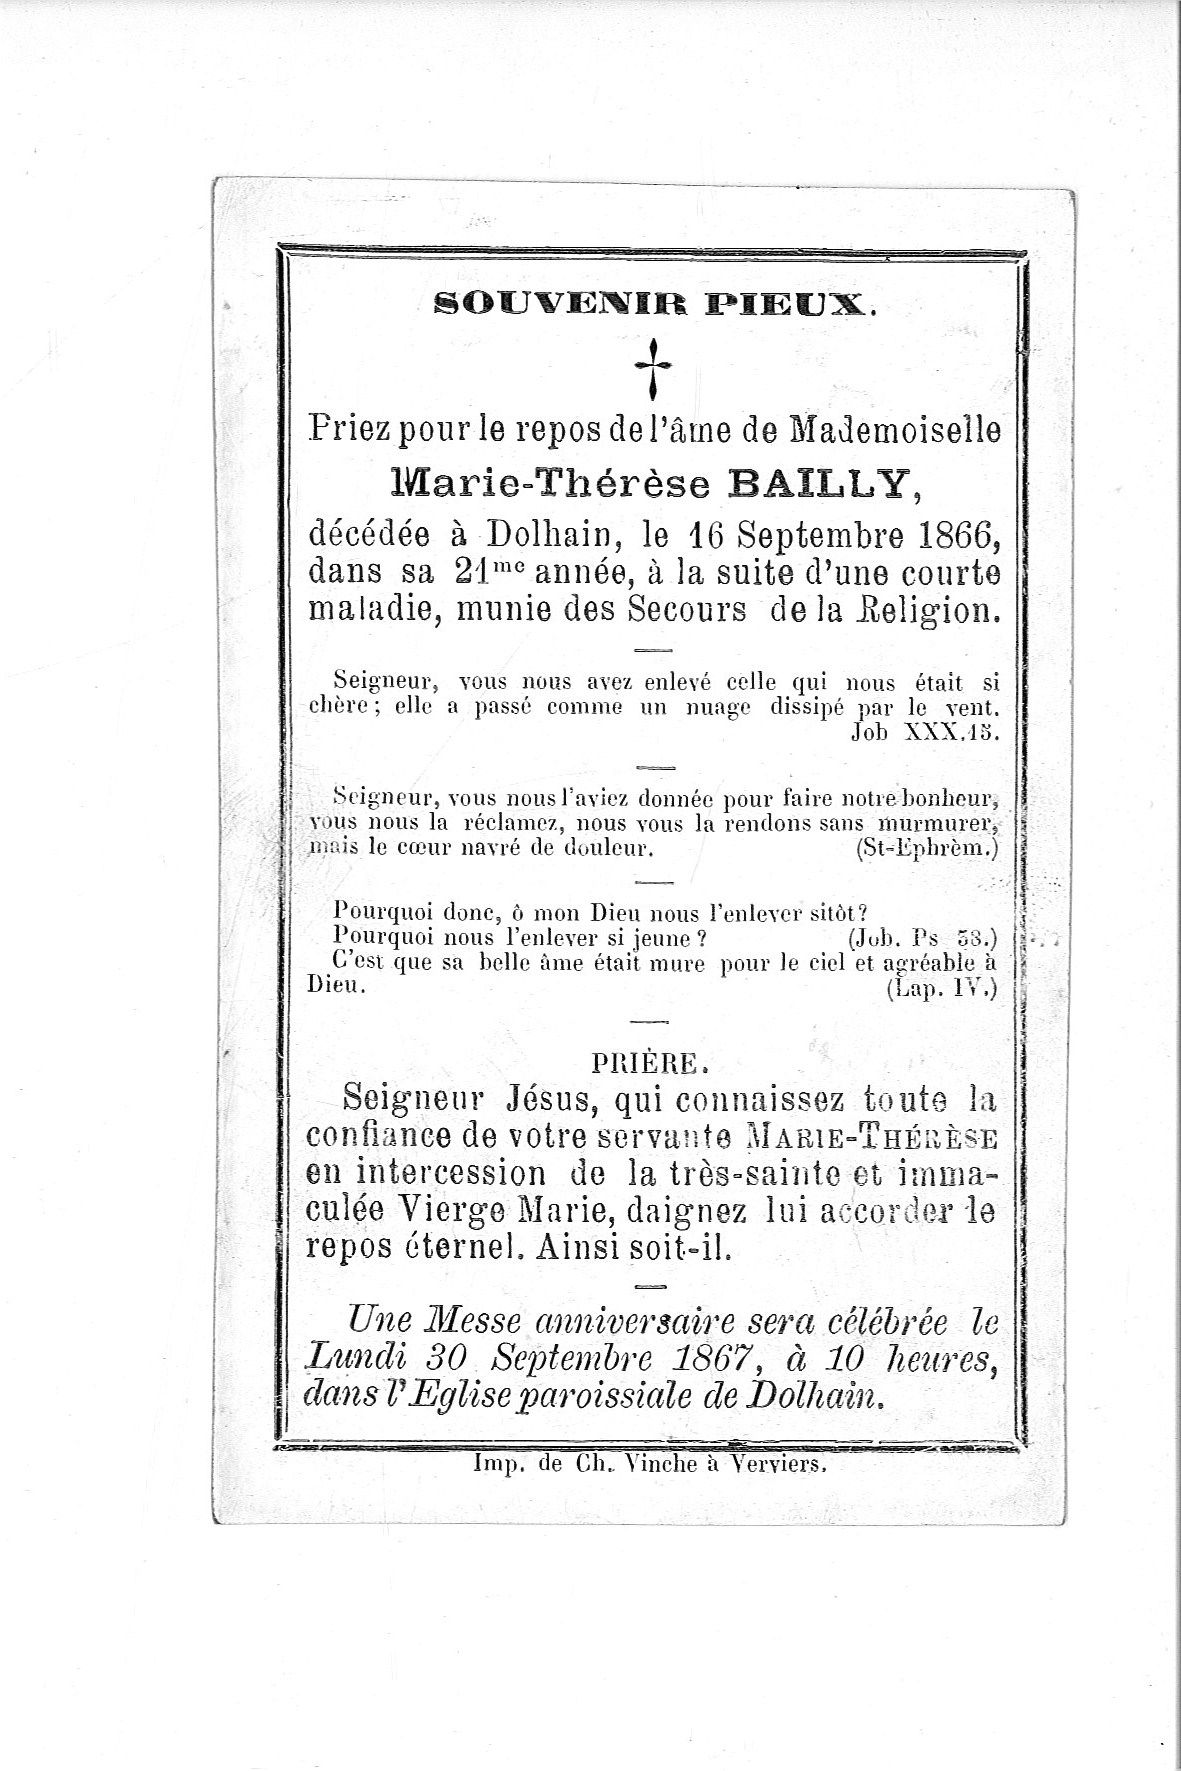 marie-thérèse(1867)20090528120156_00013.jpg